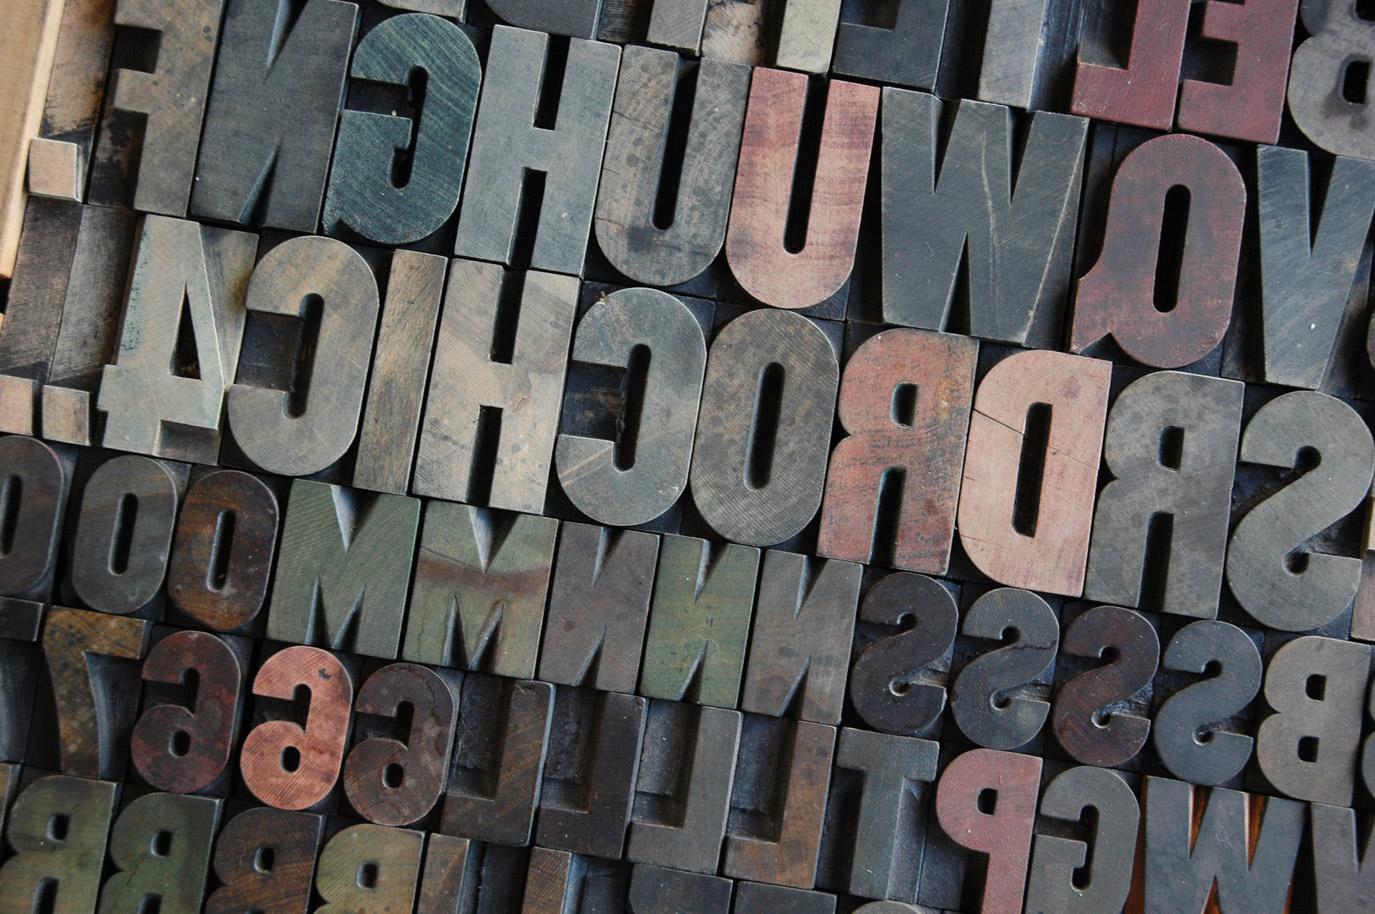 Estudio / Imprenta Tintanegra Letterpress 15